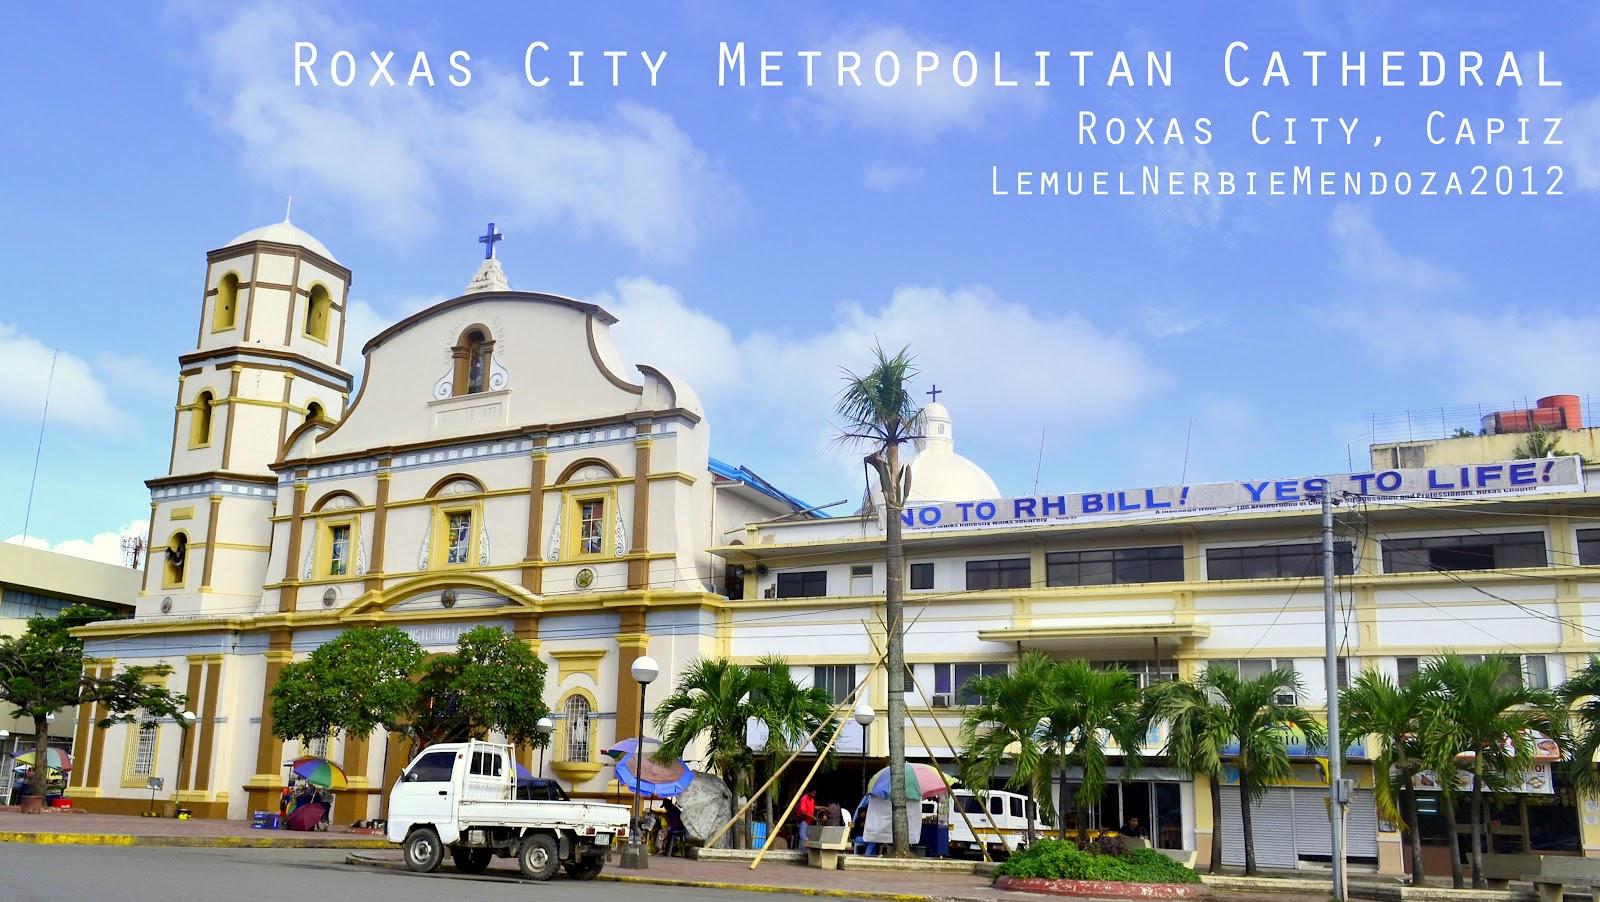 Roxas City (Capiz) Philippines  City new picture : ... de las Filipinas: ROXAS CITY, Capiz: Roxas Metropolitan Cathedral